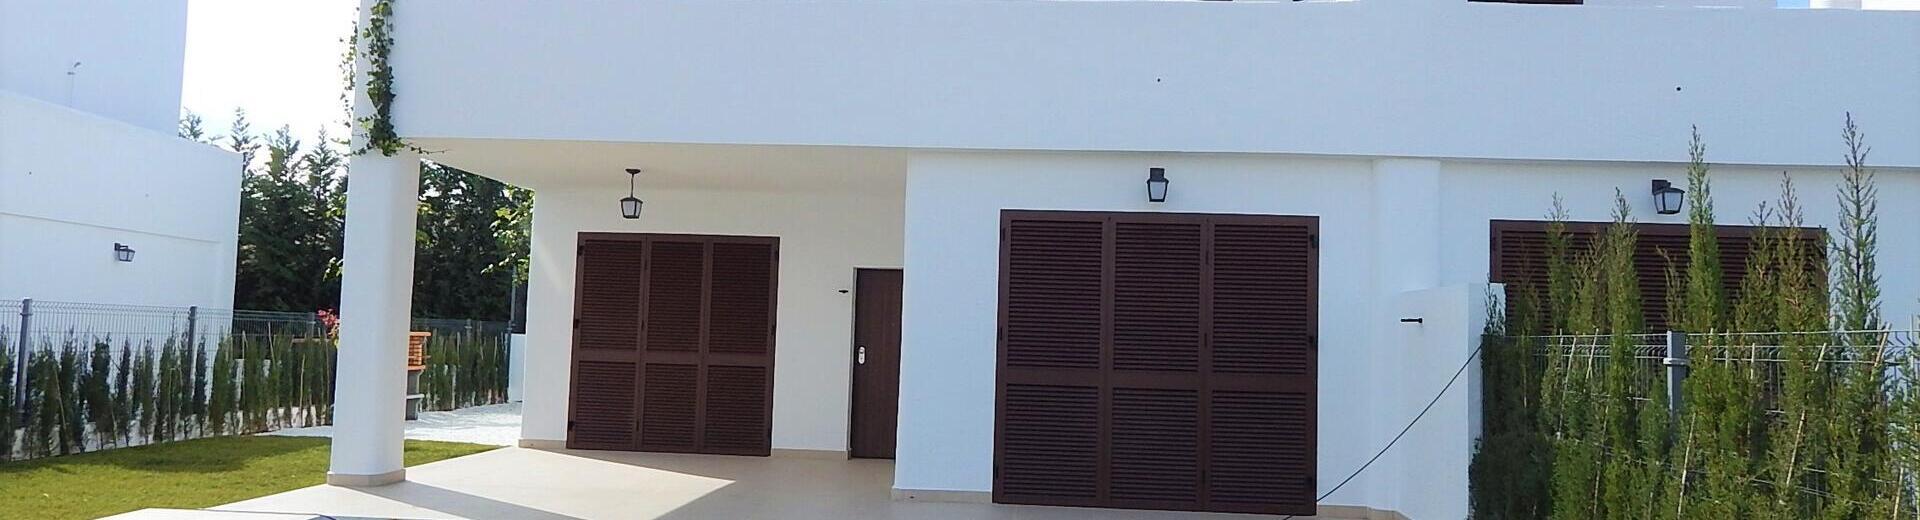 VIP7542: Villa à vendre